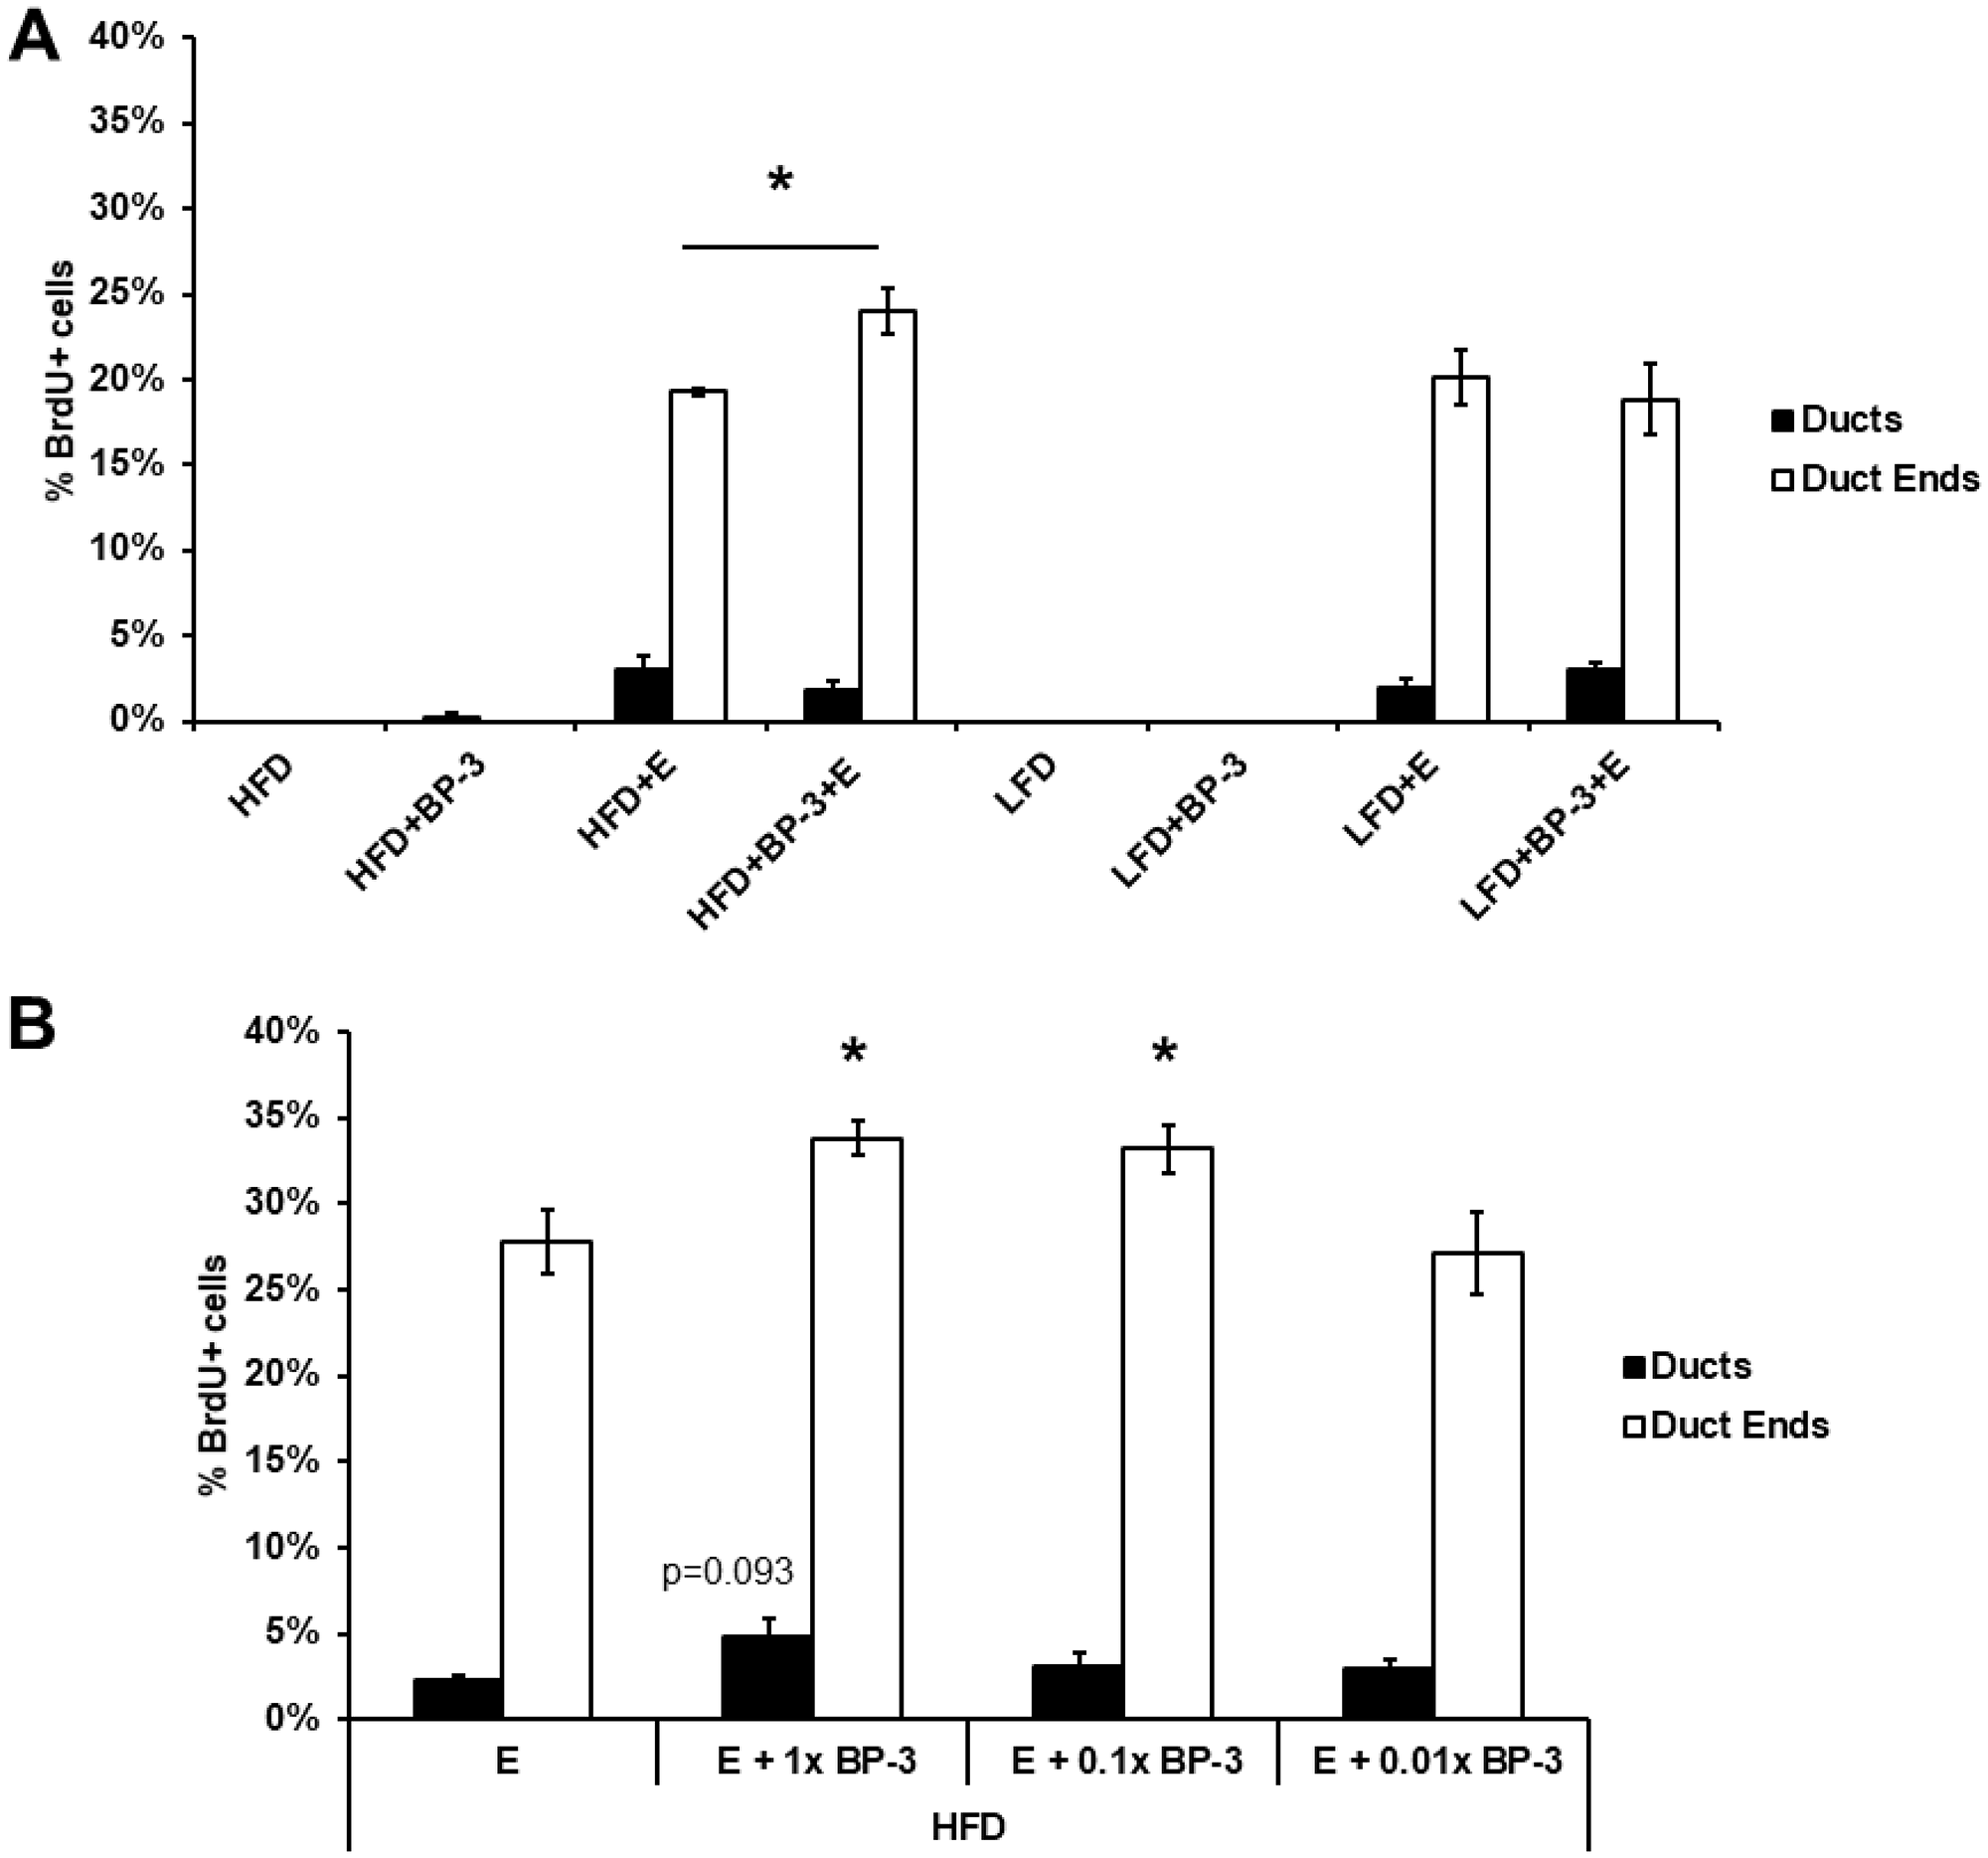 BP-3 enhances estrogen-stimulated mammary gland proliferation in pubertal mice fed HFD.